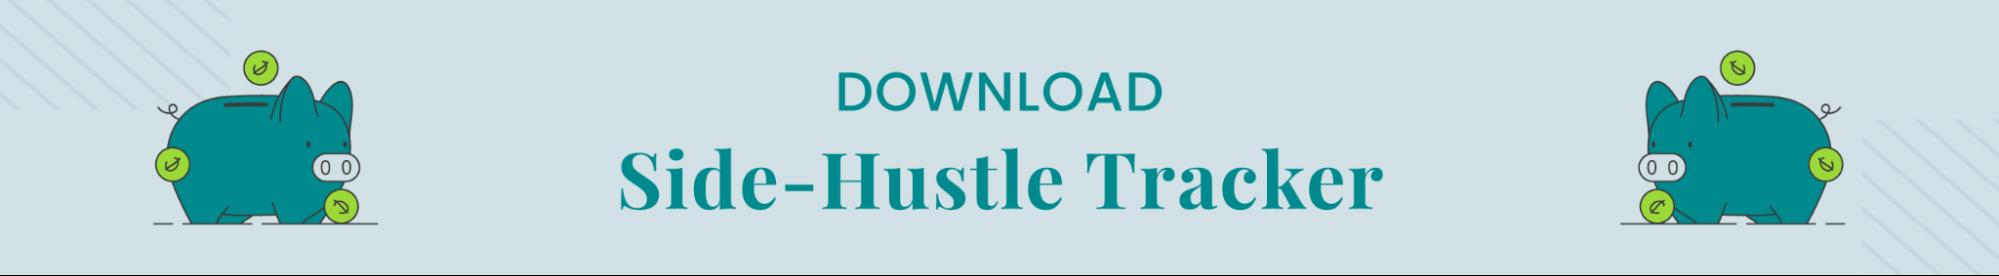 Download Side-Hustle Tracker button